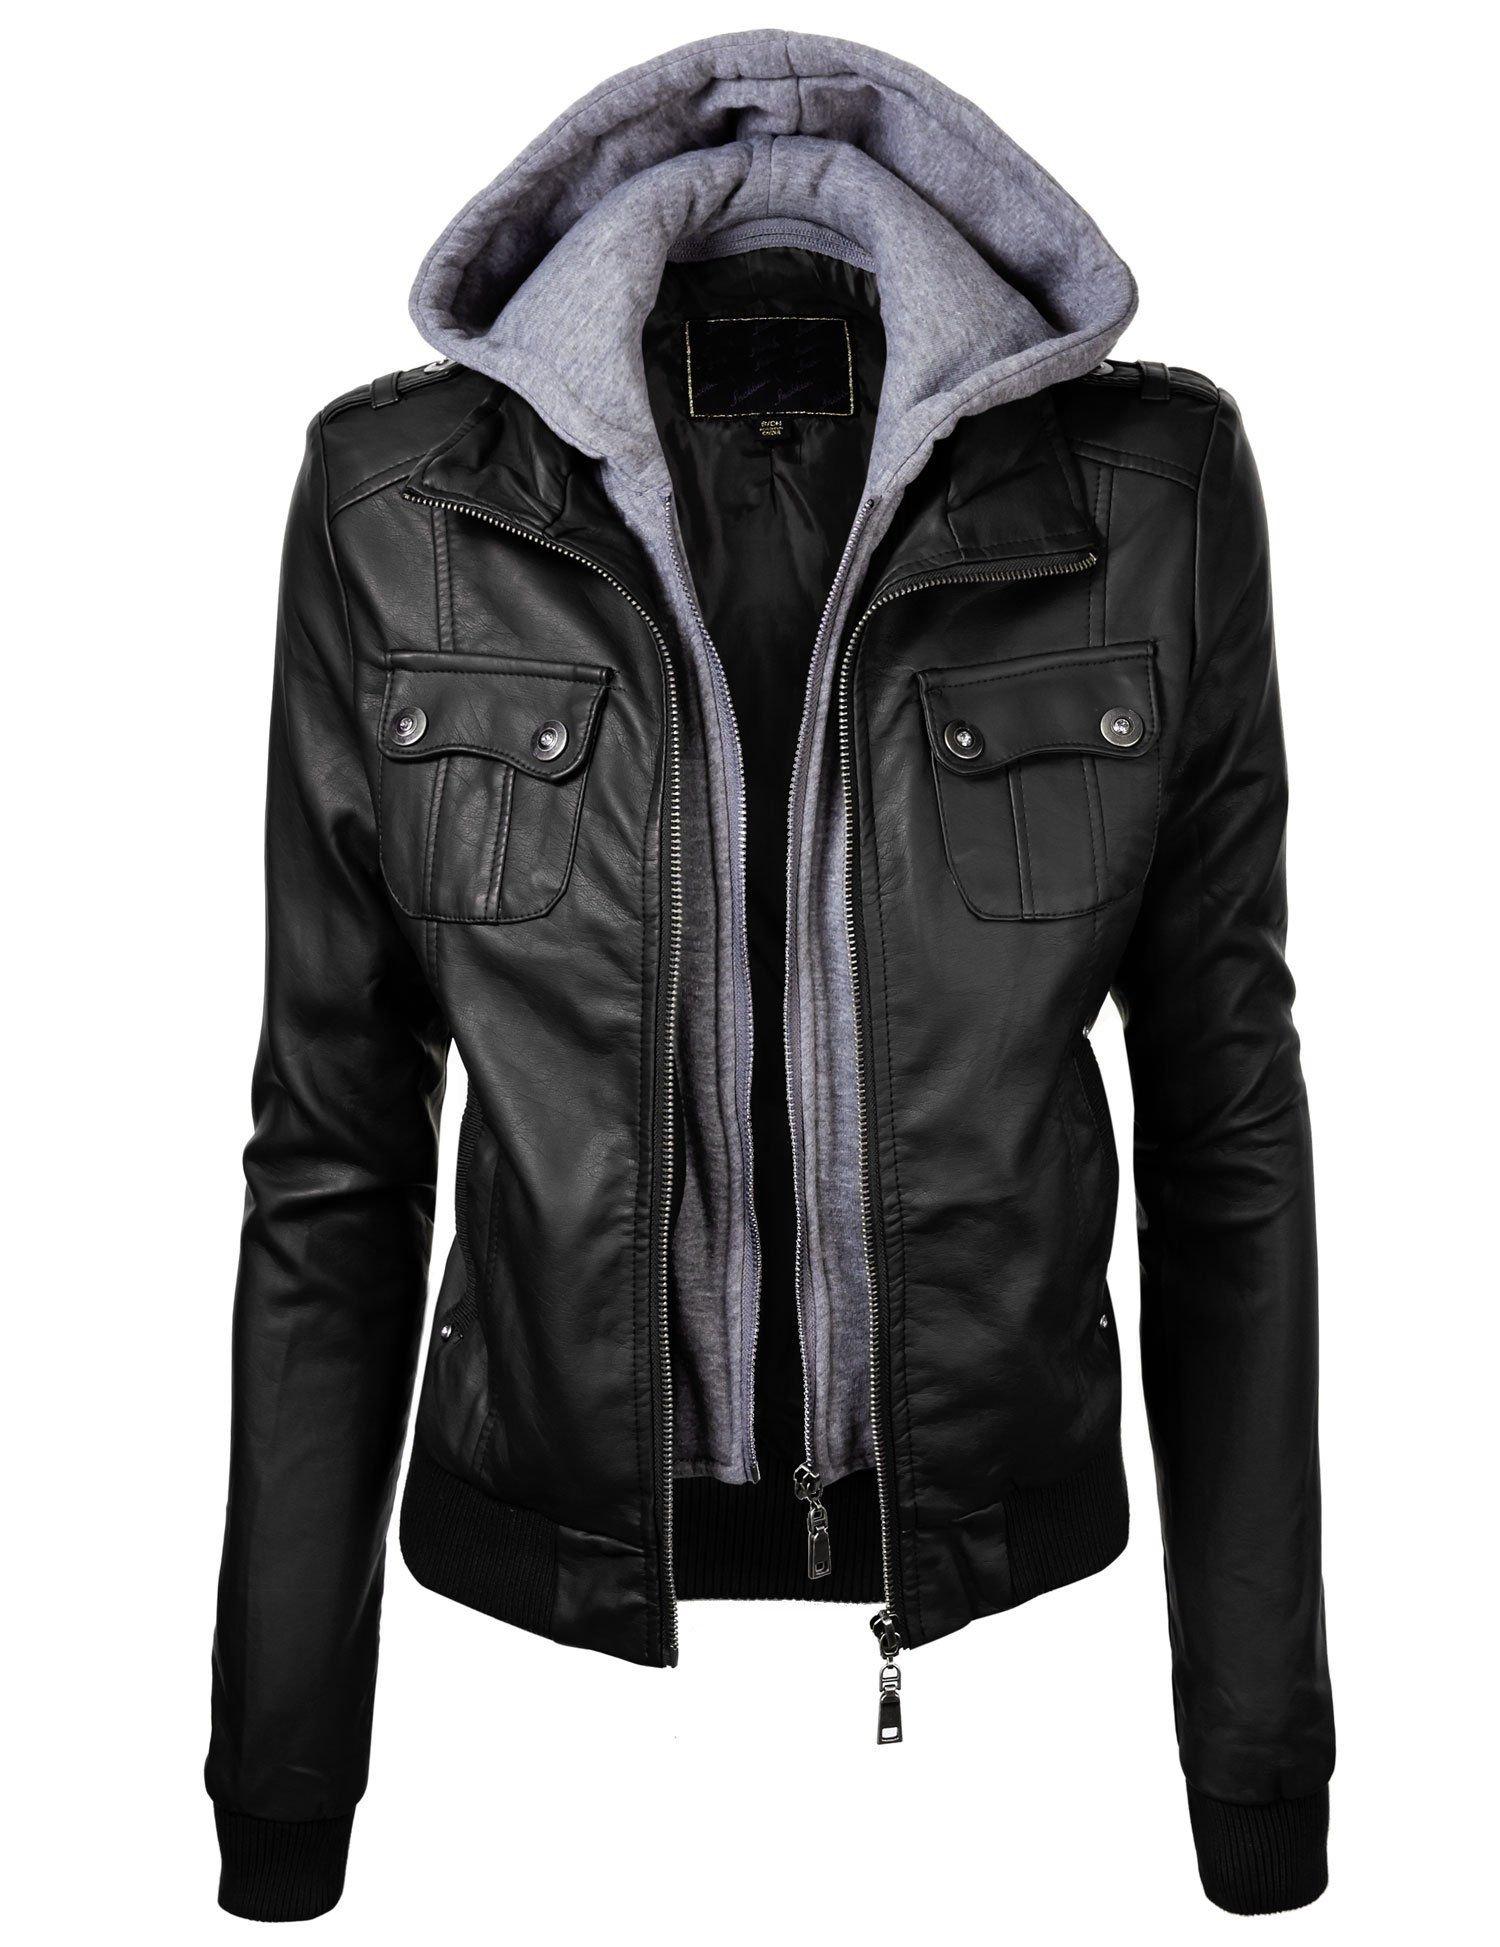 Leather Jacket w/ Hoodie